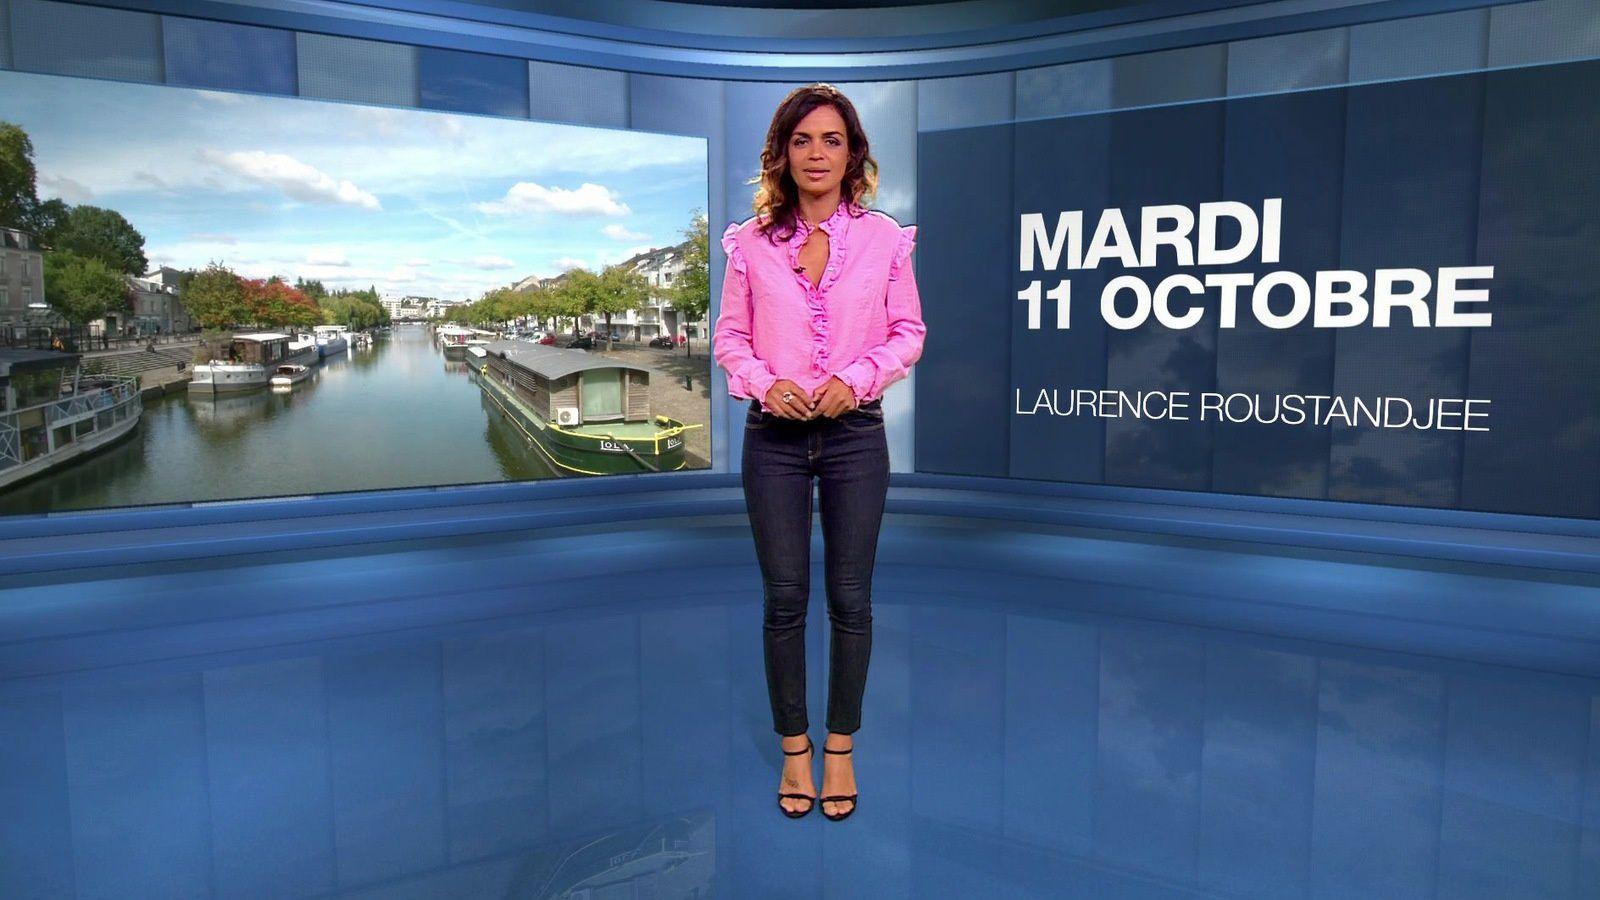 LAURENCE ROUSTANDJEE @LoRoustandjee ce soir pour LA METEO @M6 #vuesalatele